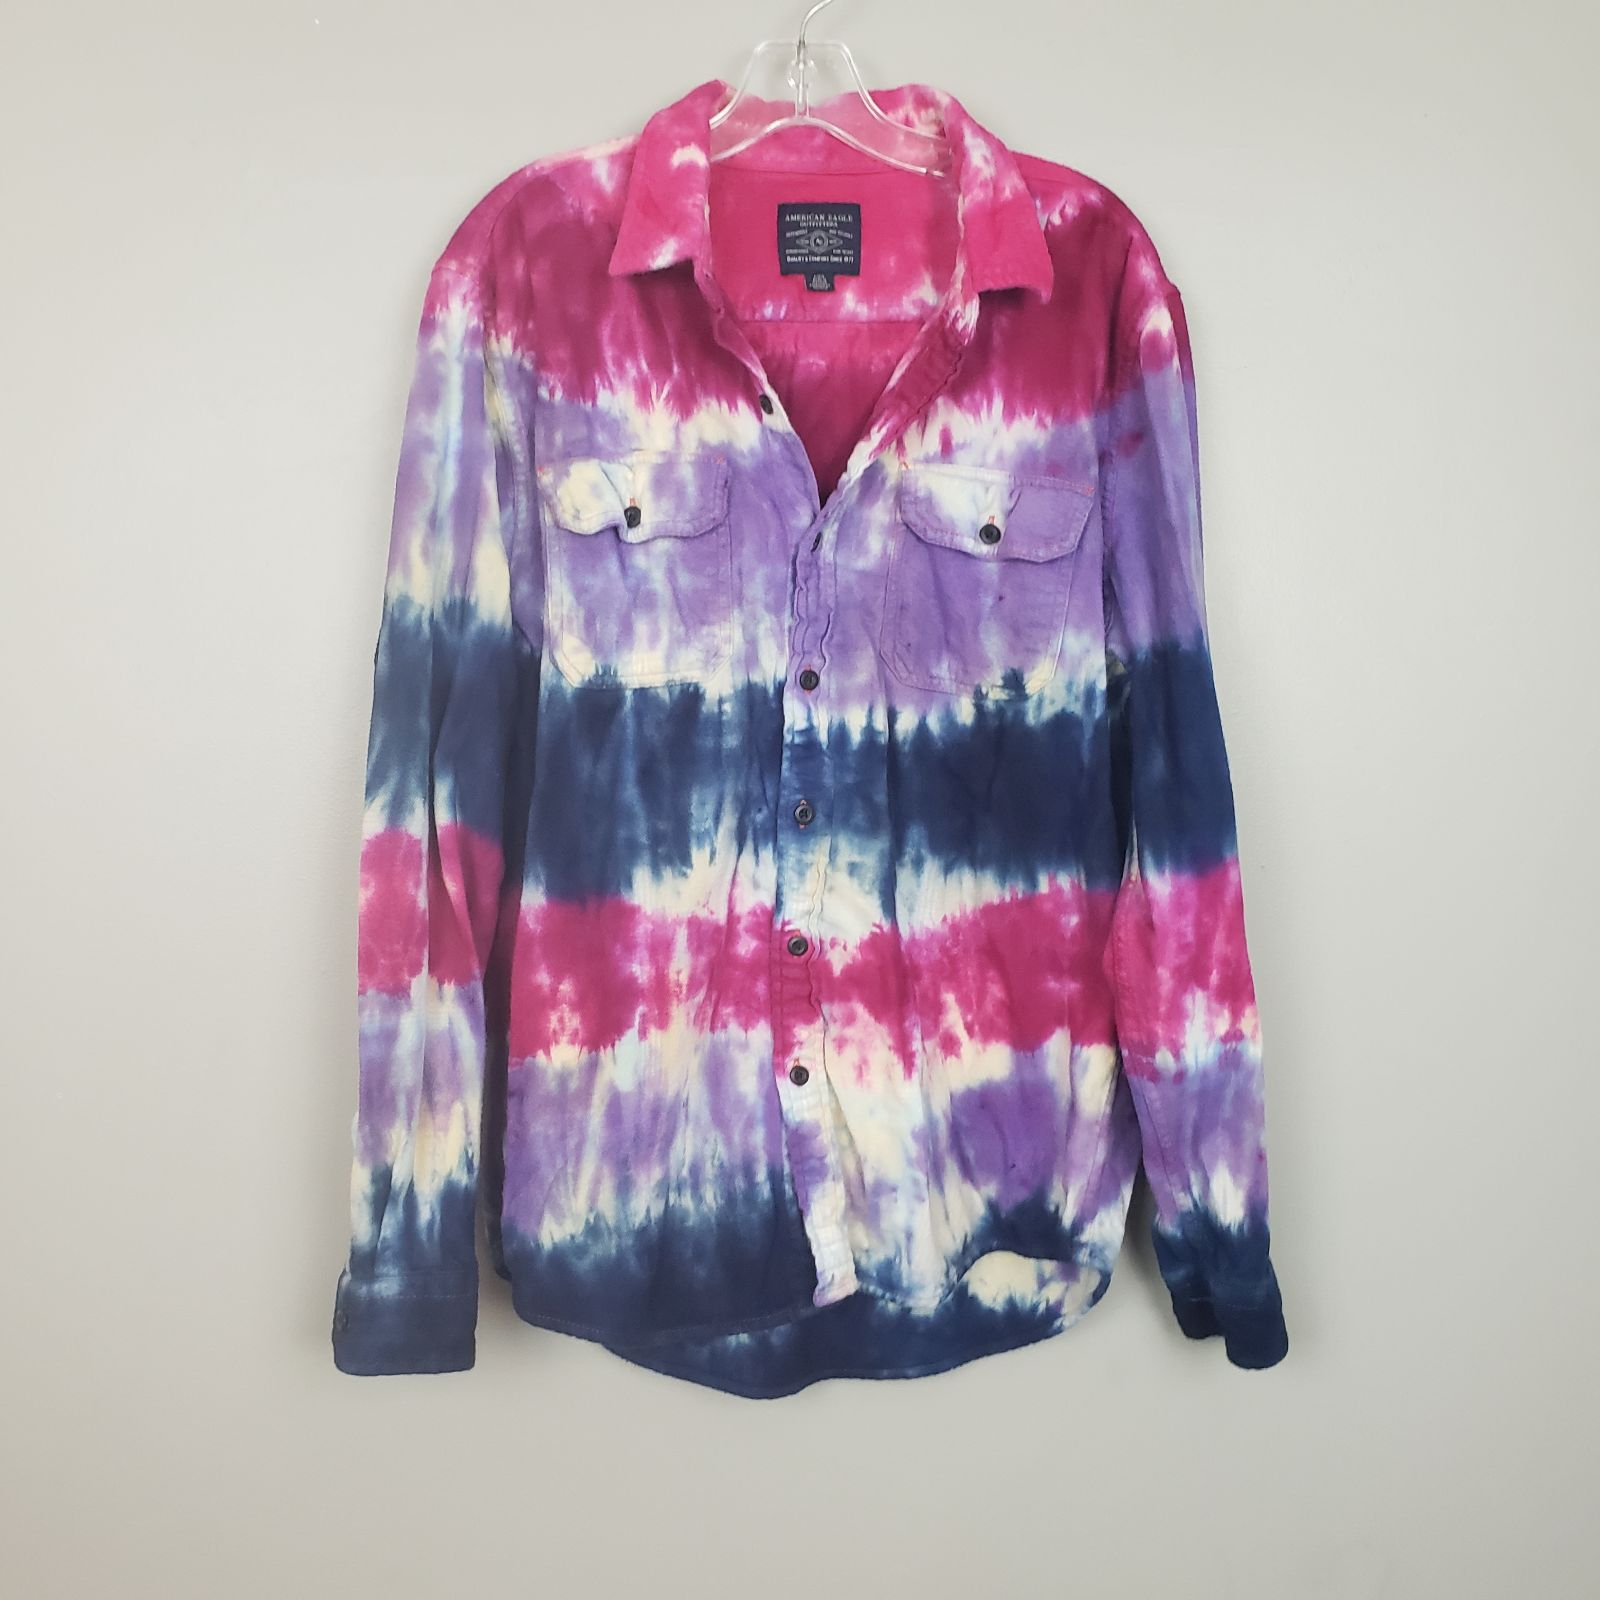 Mens Pink Plaid Tie Dye Button Down Top